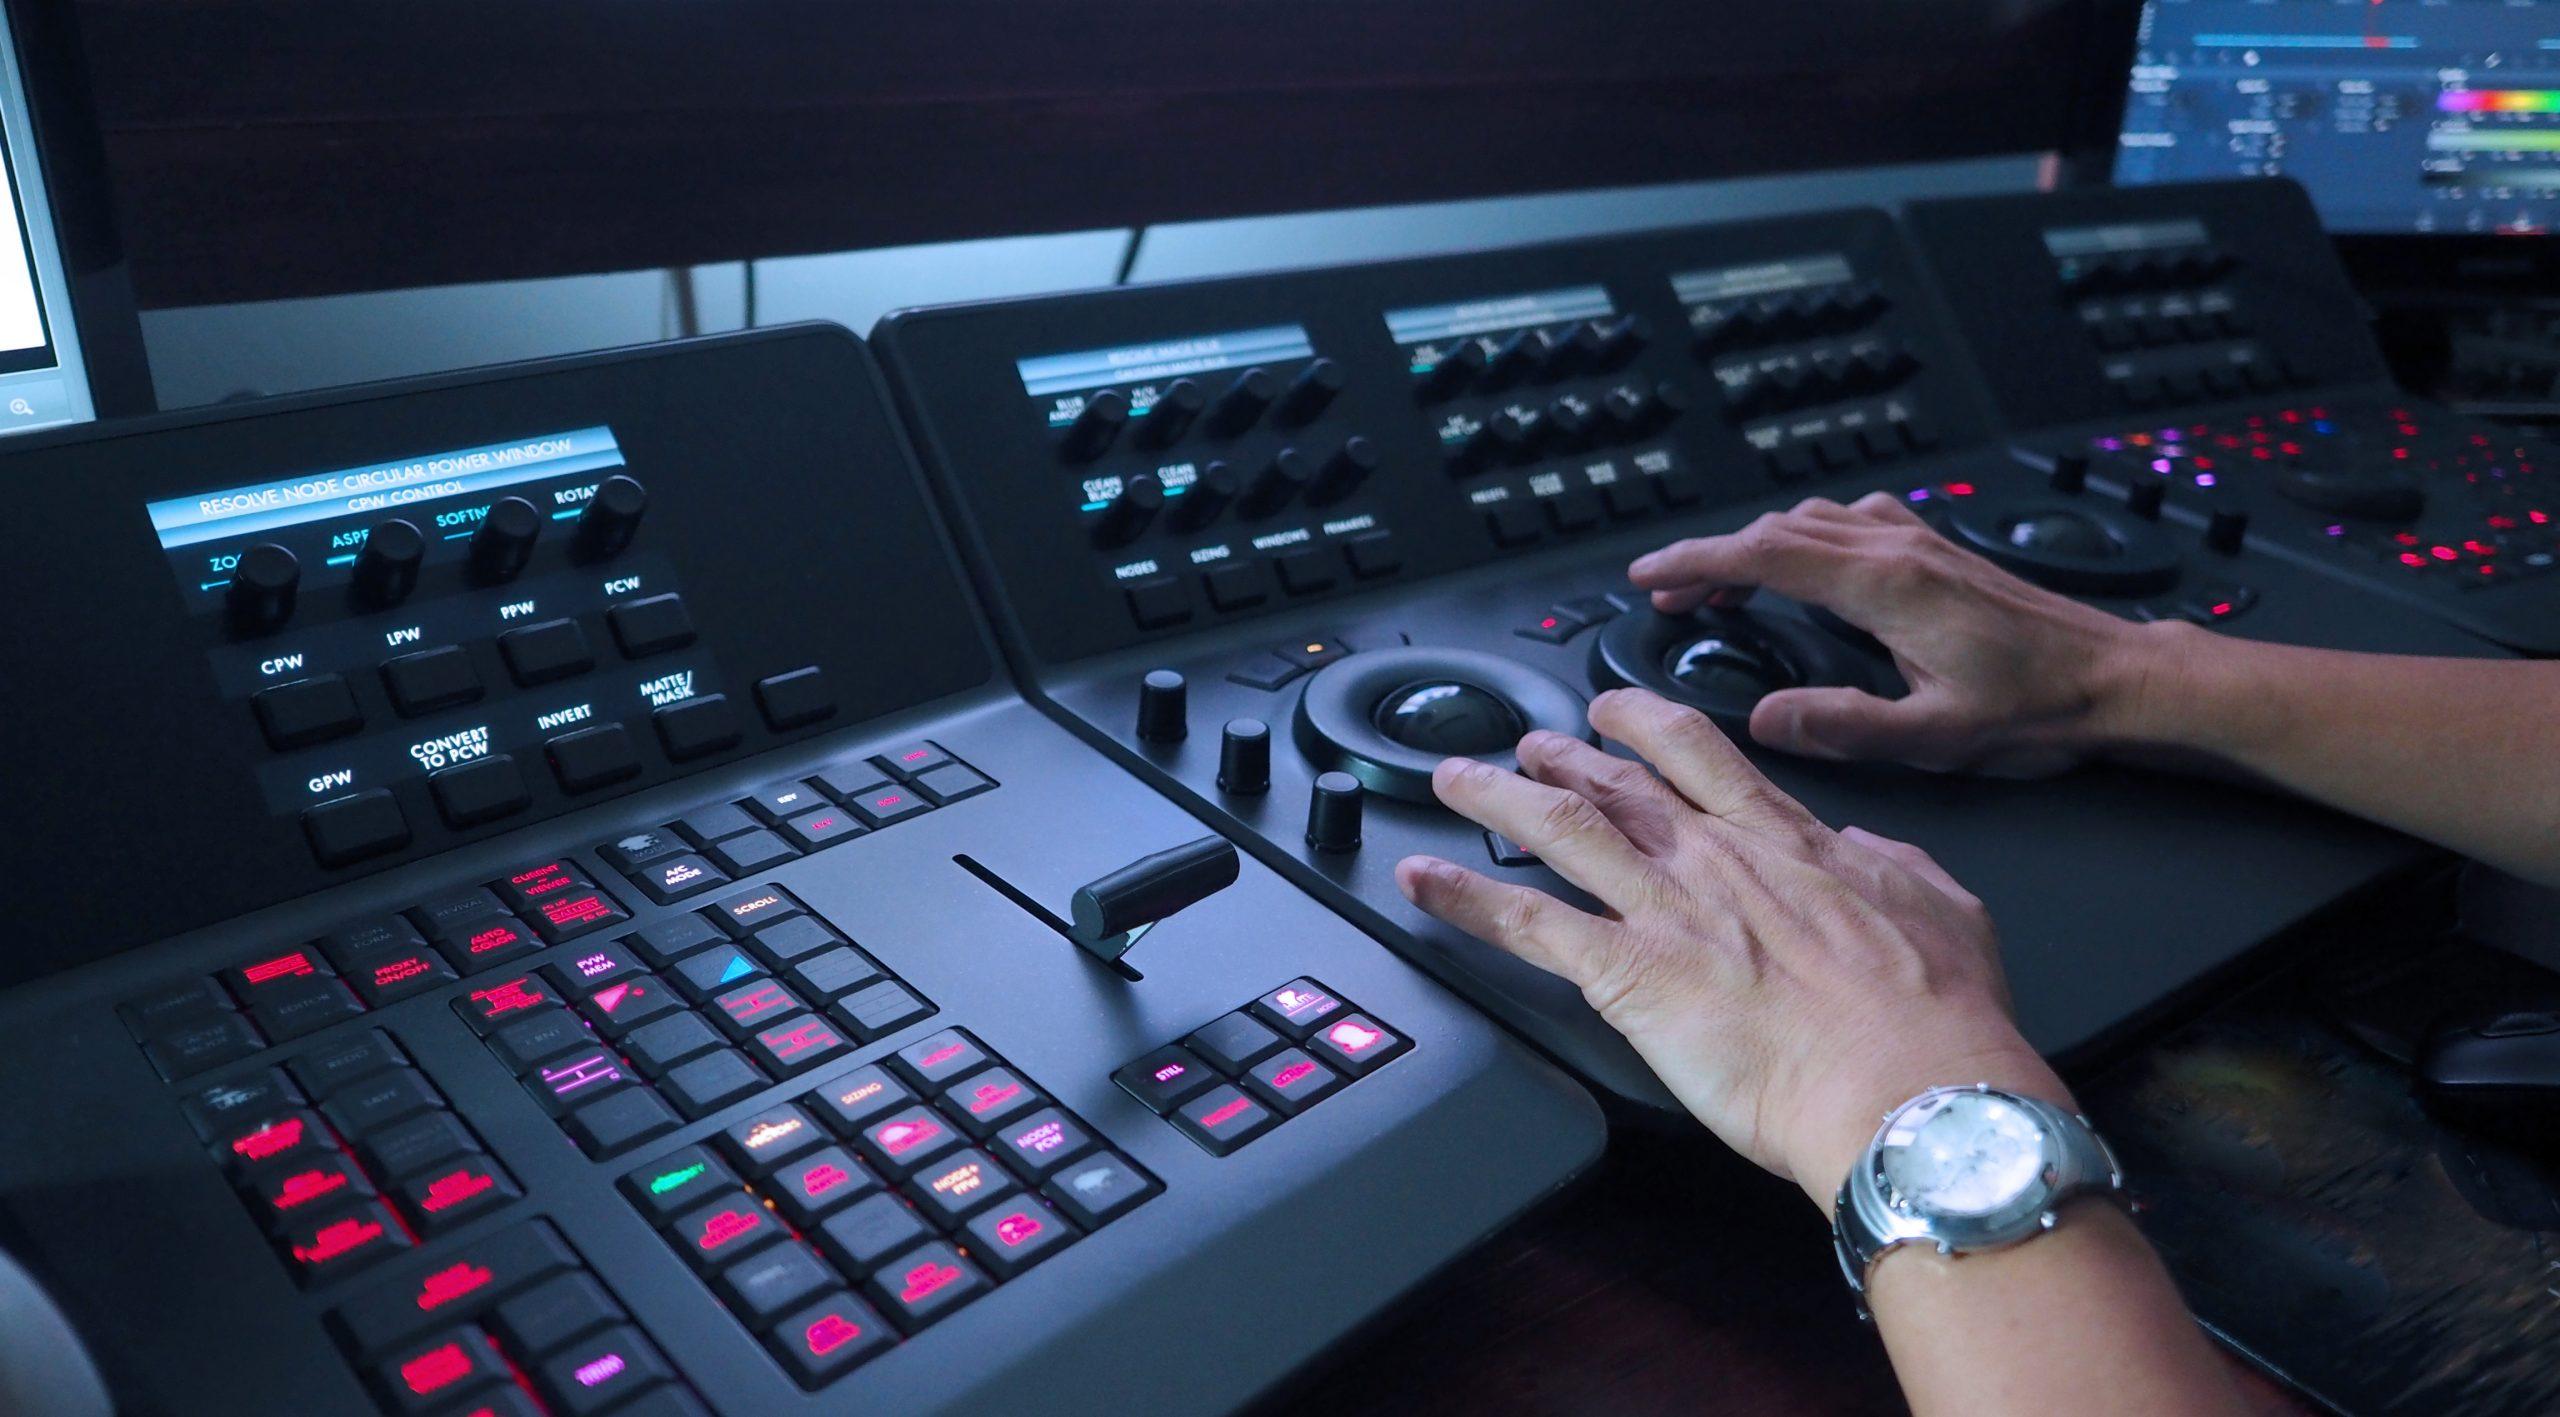 Video Studio Rental Company